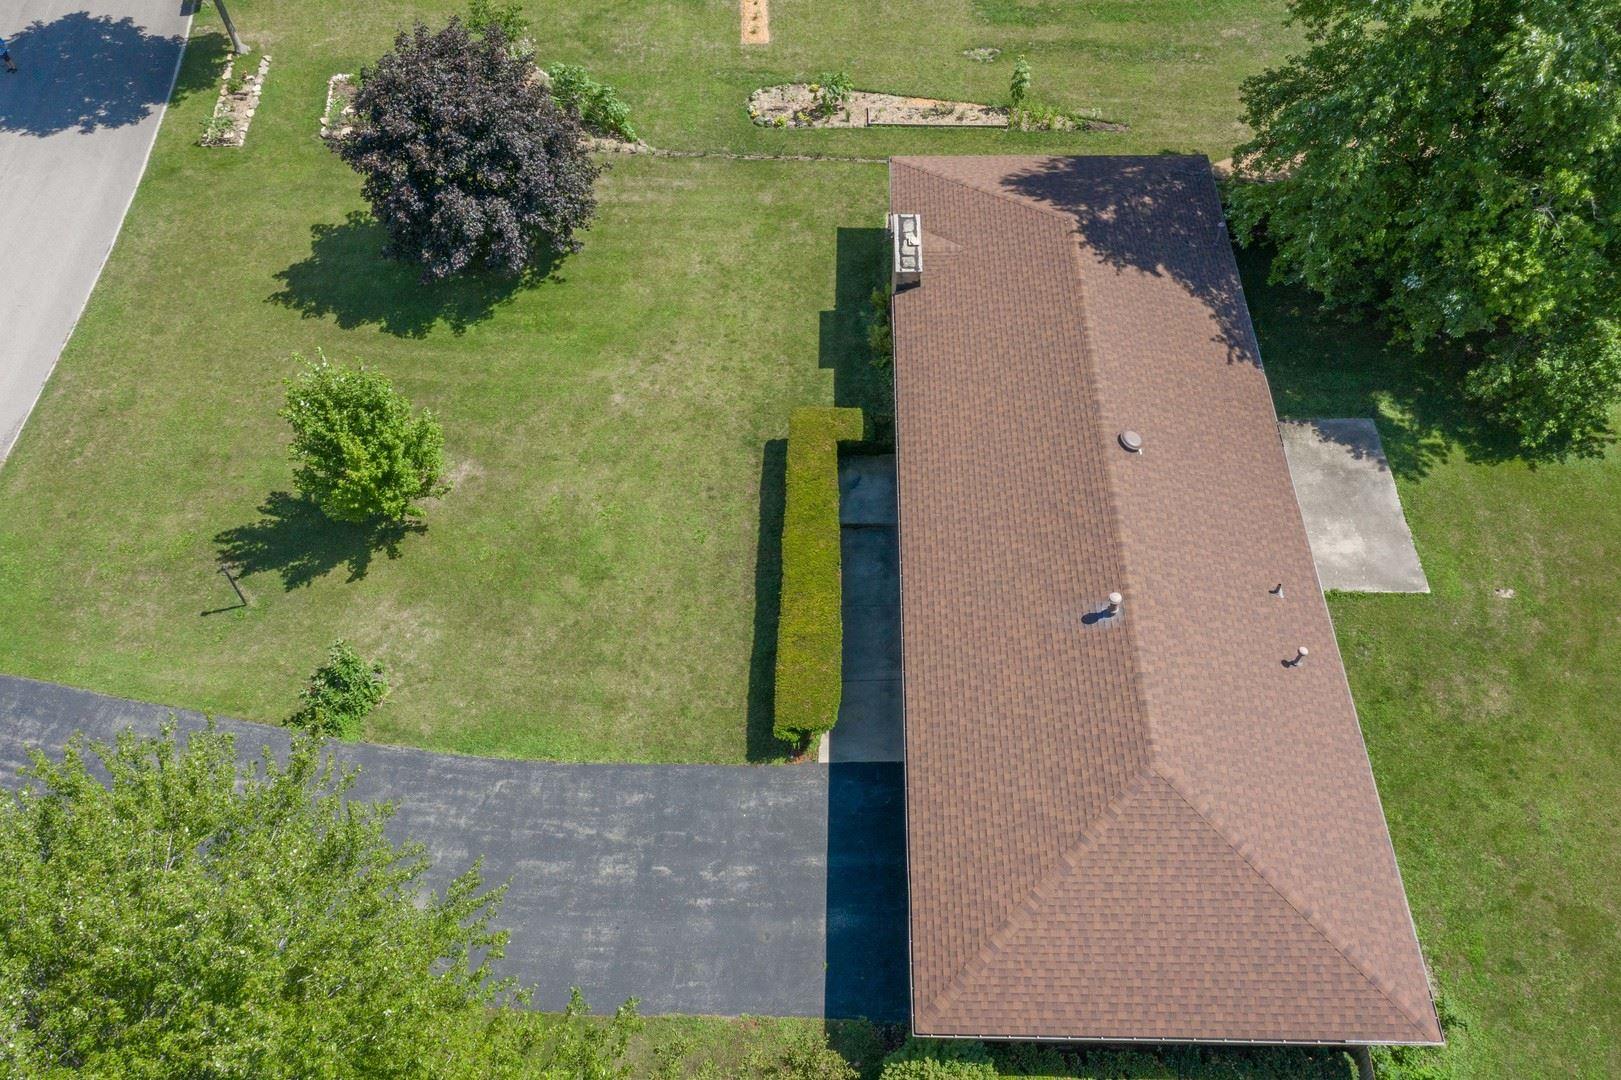 4 Patricia Lane, Yorkville, IL 60560 - #: 10784781